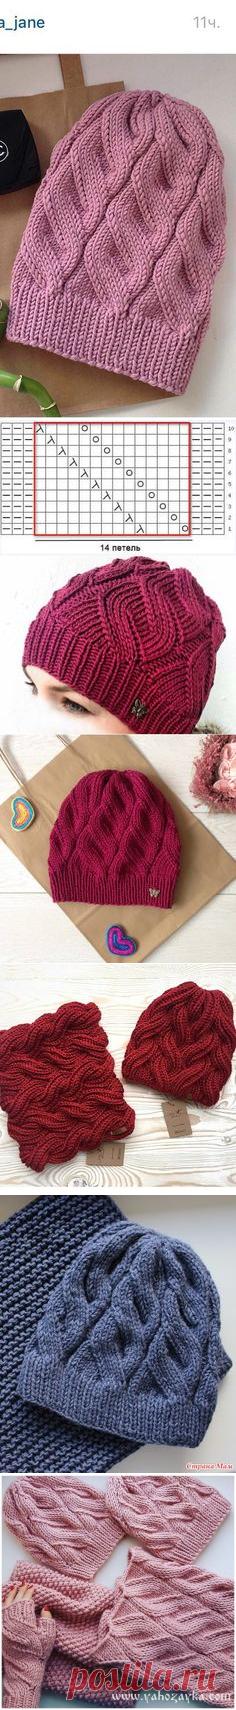 Стильный комплект: шапка, митенки, снуд спицами. Шапочка и снуд связанные спицами объемным узором лало-коса. | Knitting | Crochet, Chrochet and Sew…